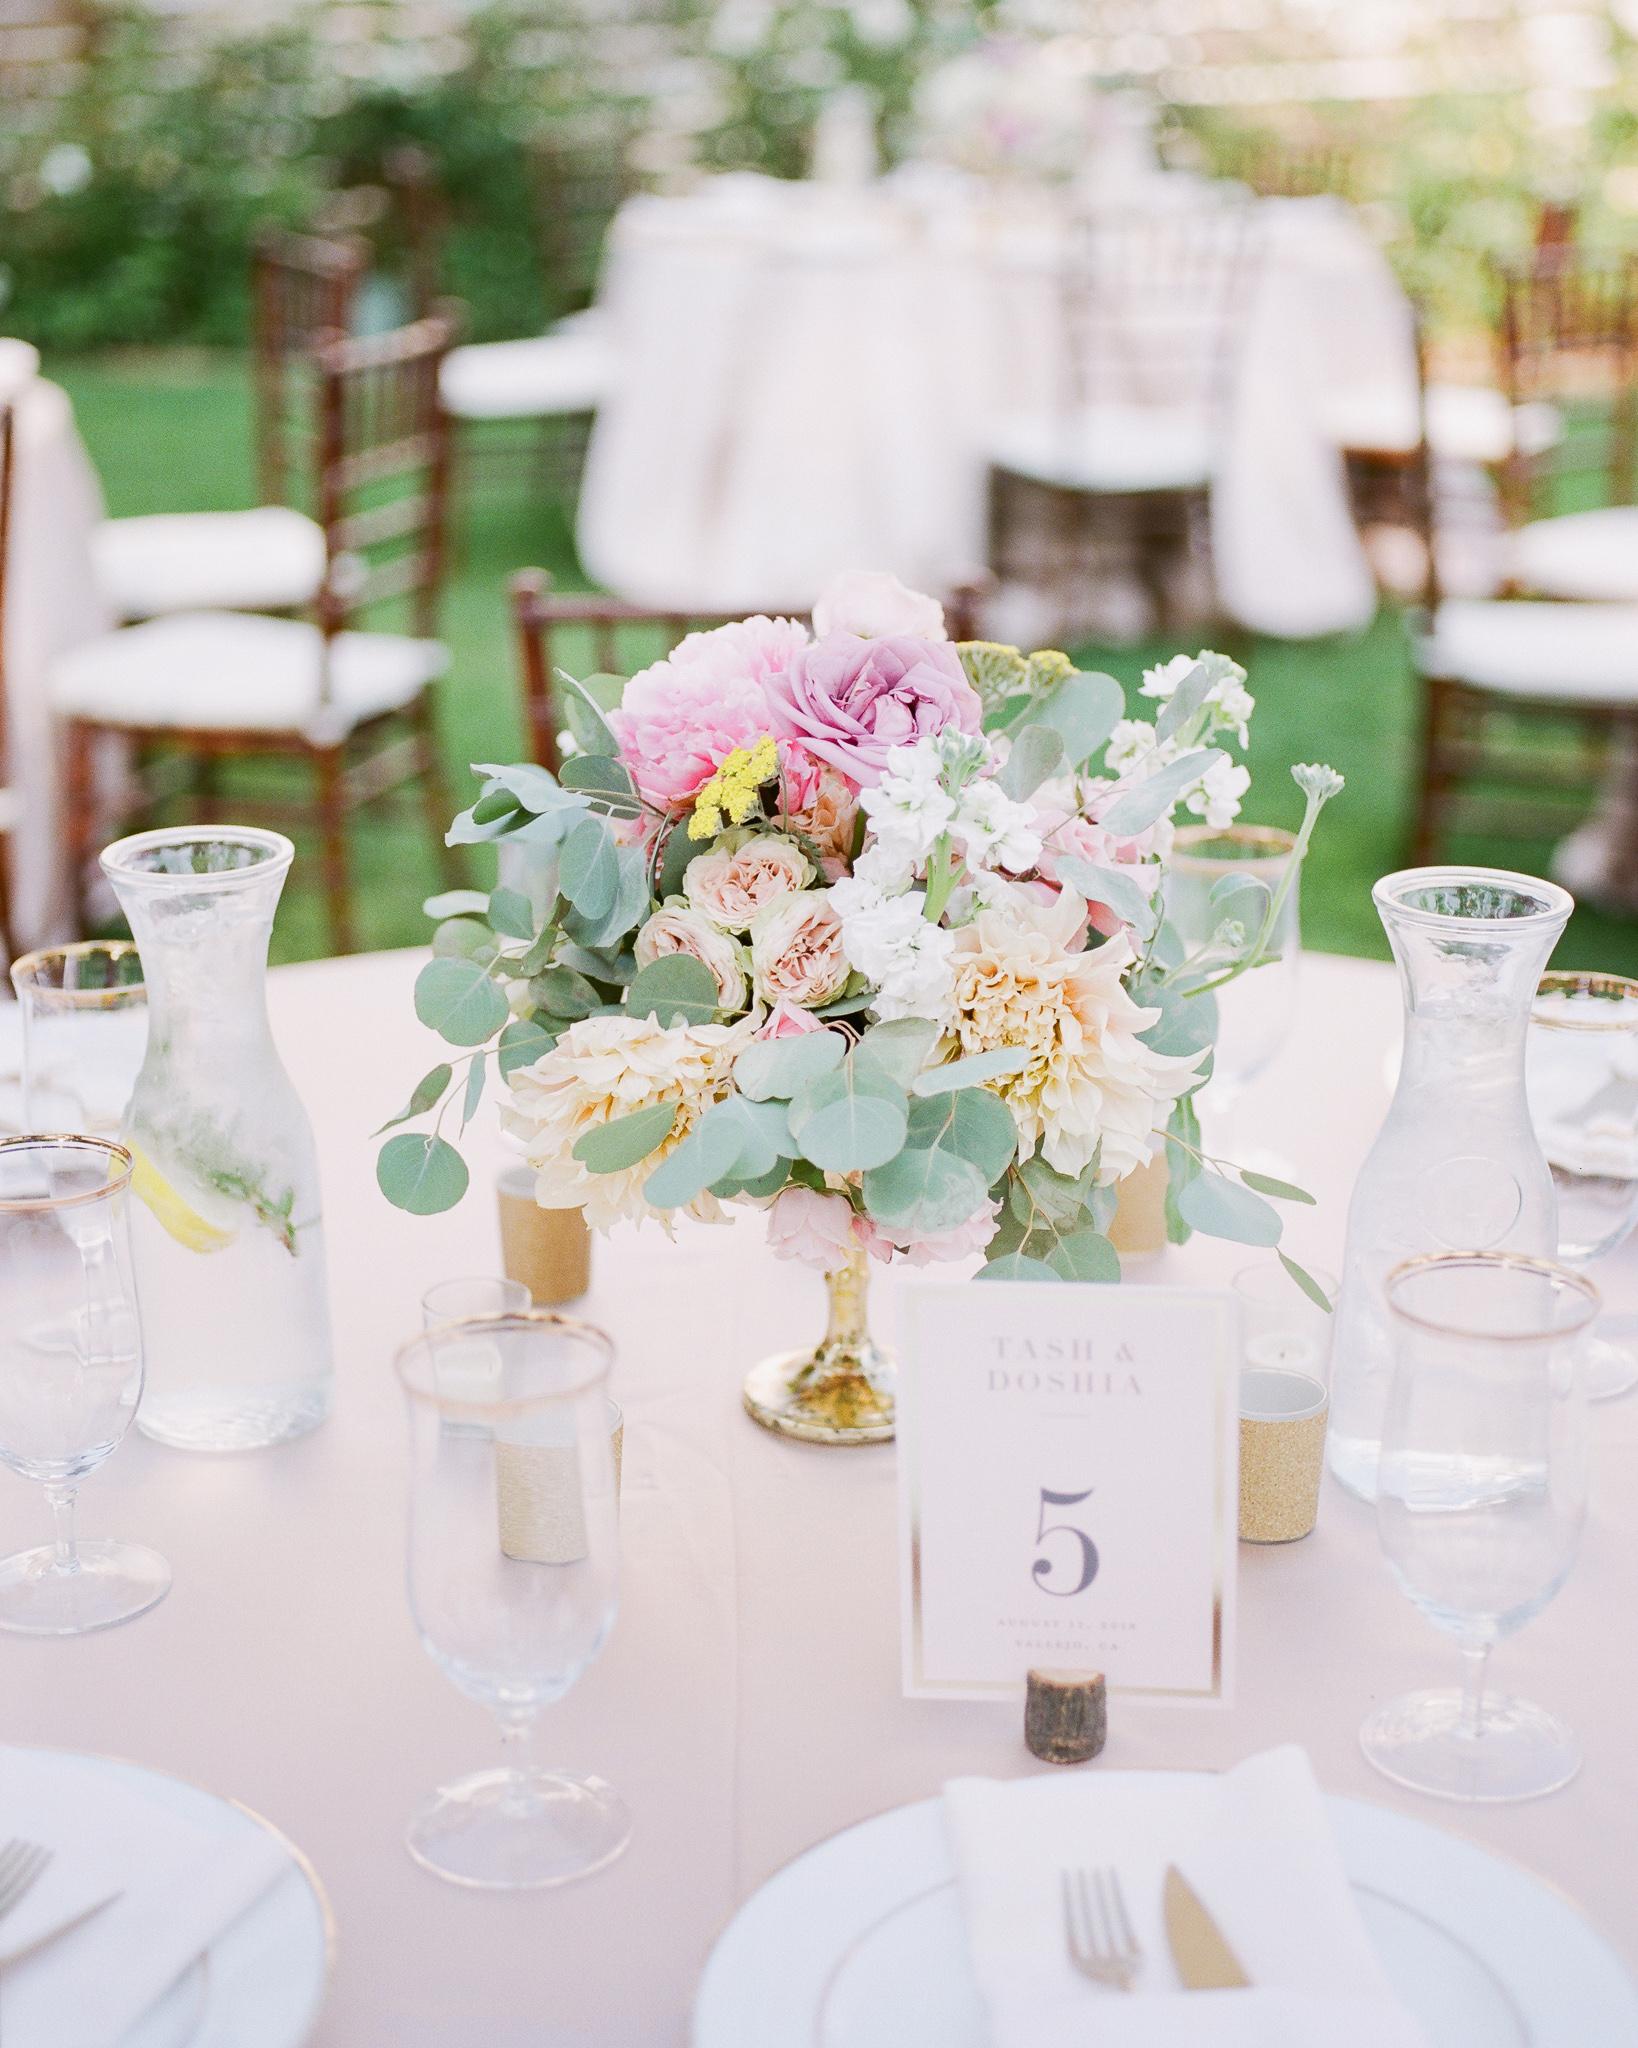 floral arrangement centerpiece in gold vessel plus table number